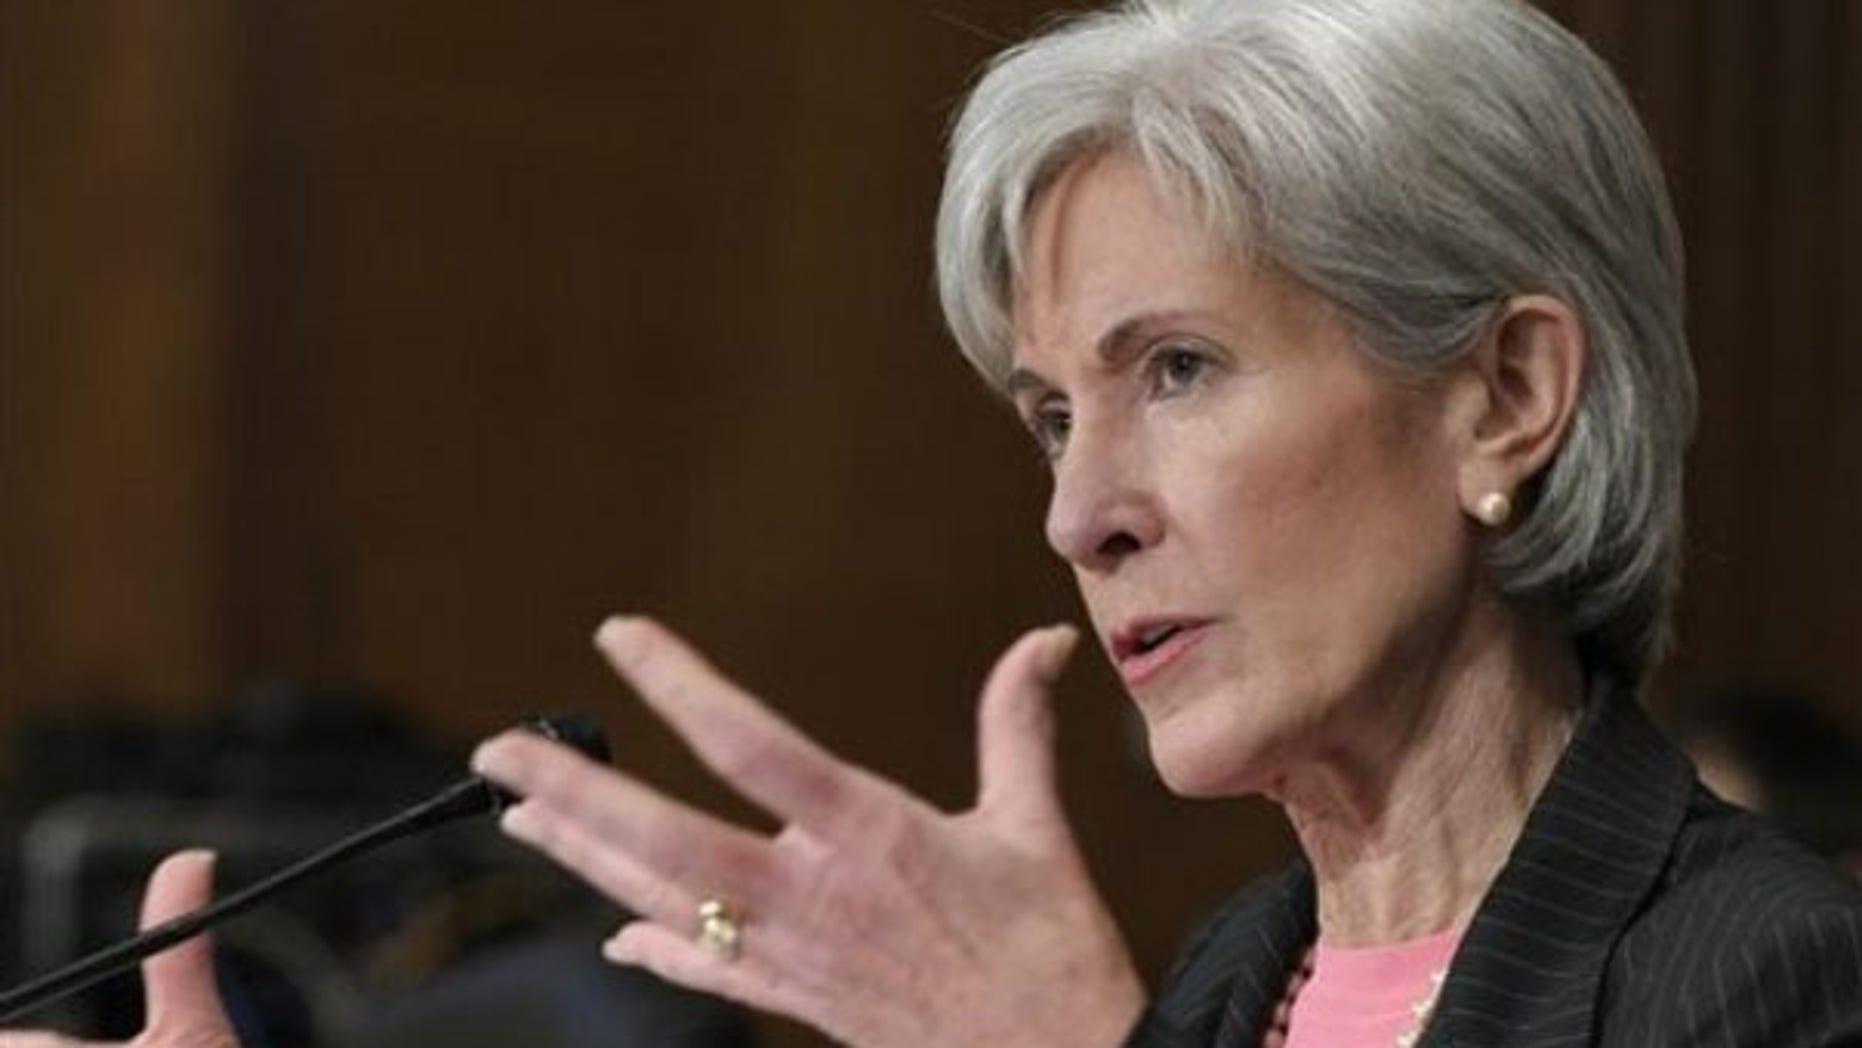 Health and Human Services Secretary Kathleen Sebelius testifies on Capitol Hill Feb. 3. (AP Photo)